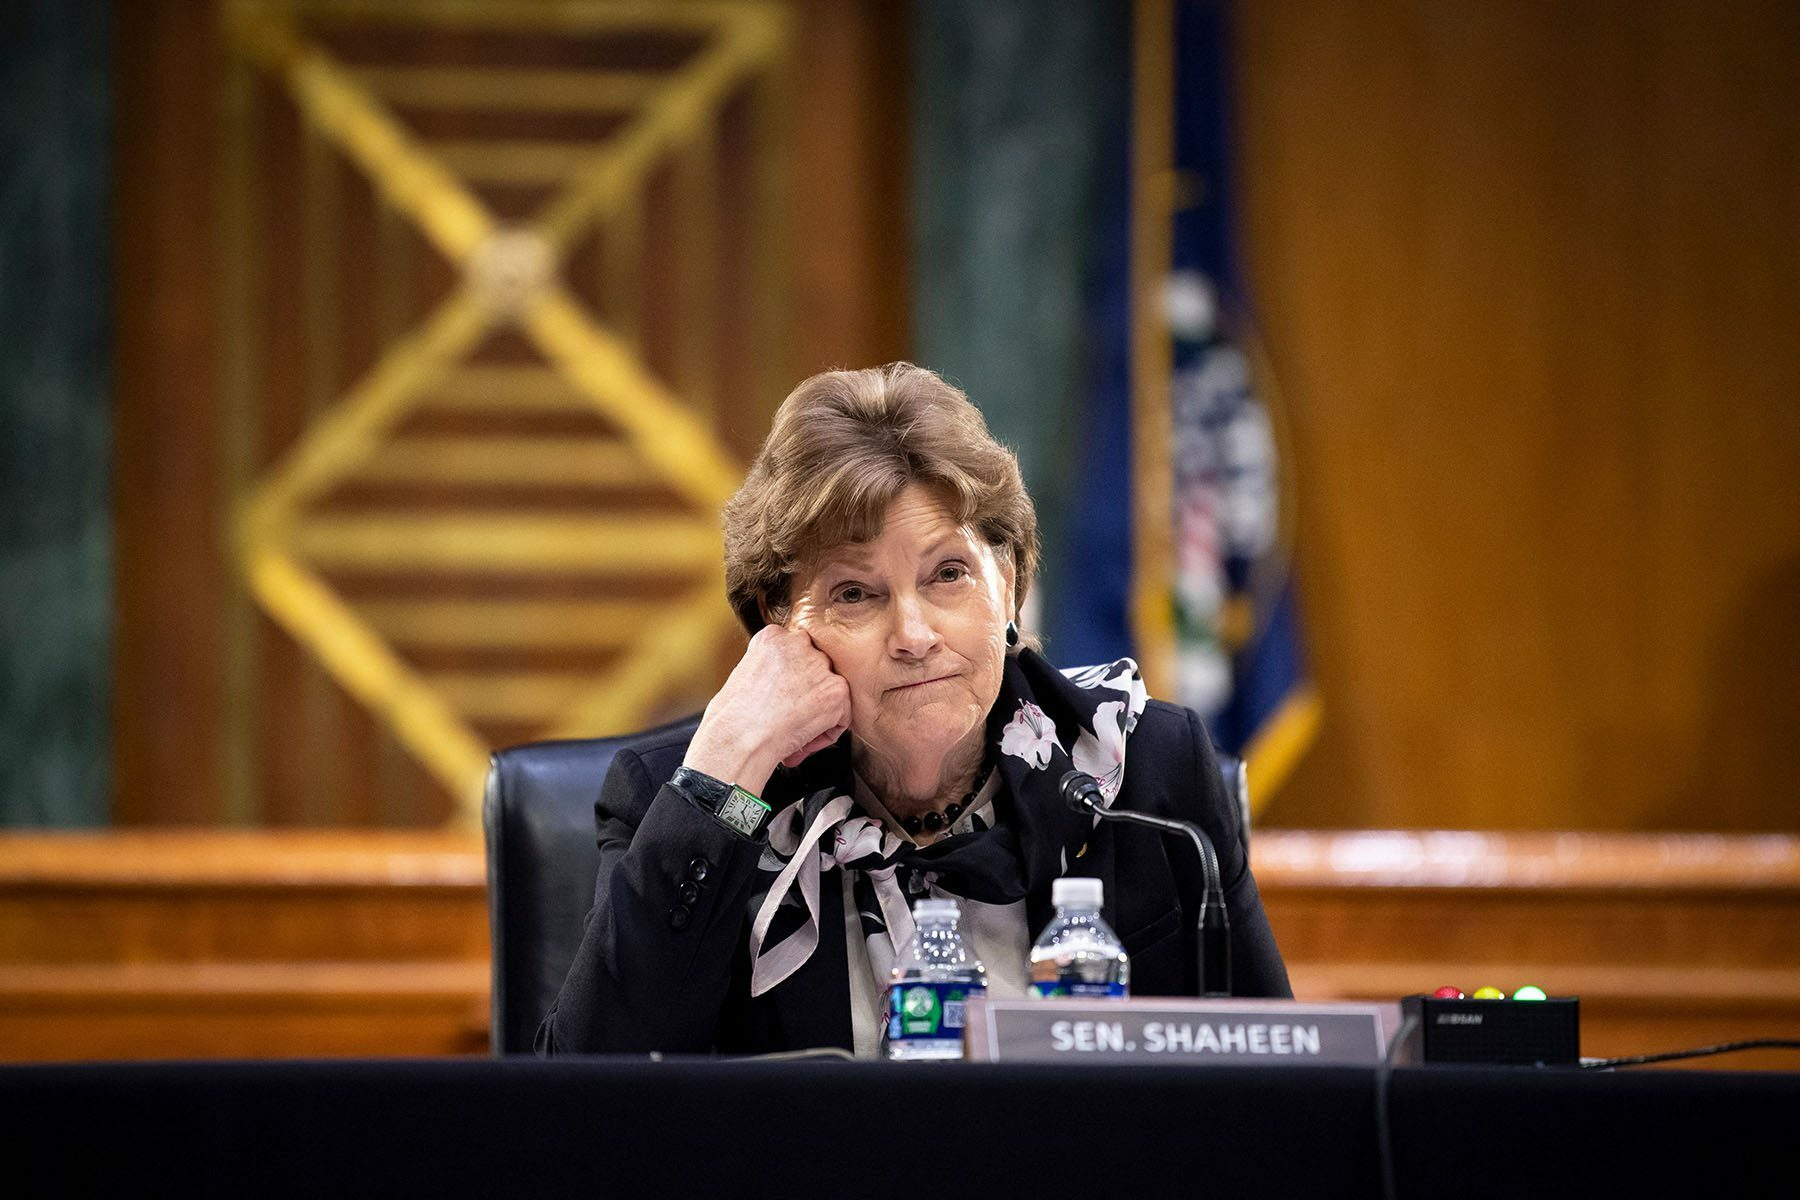 Sen. Shaheen sits behind a desk on Capitol Hill.